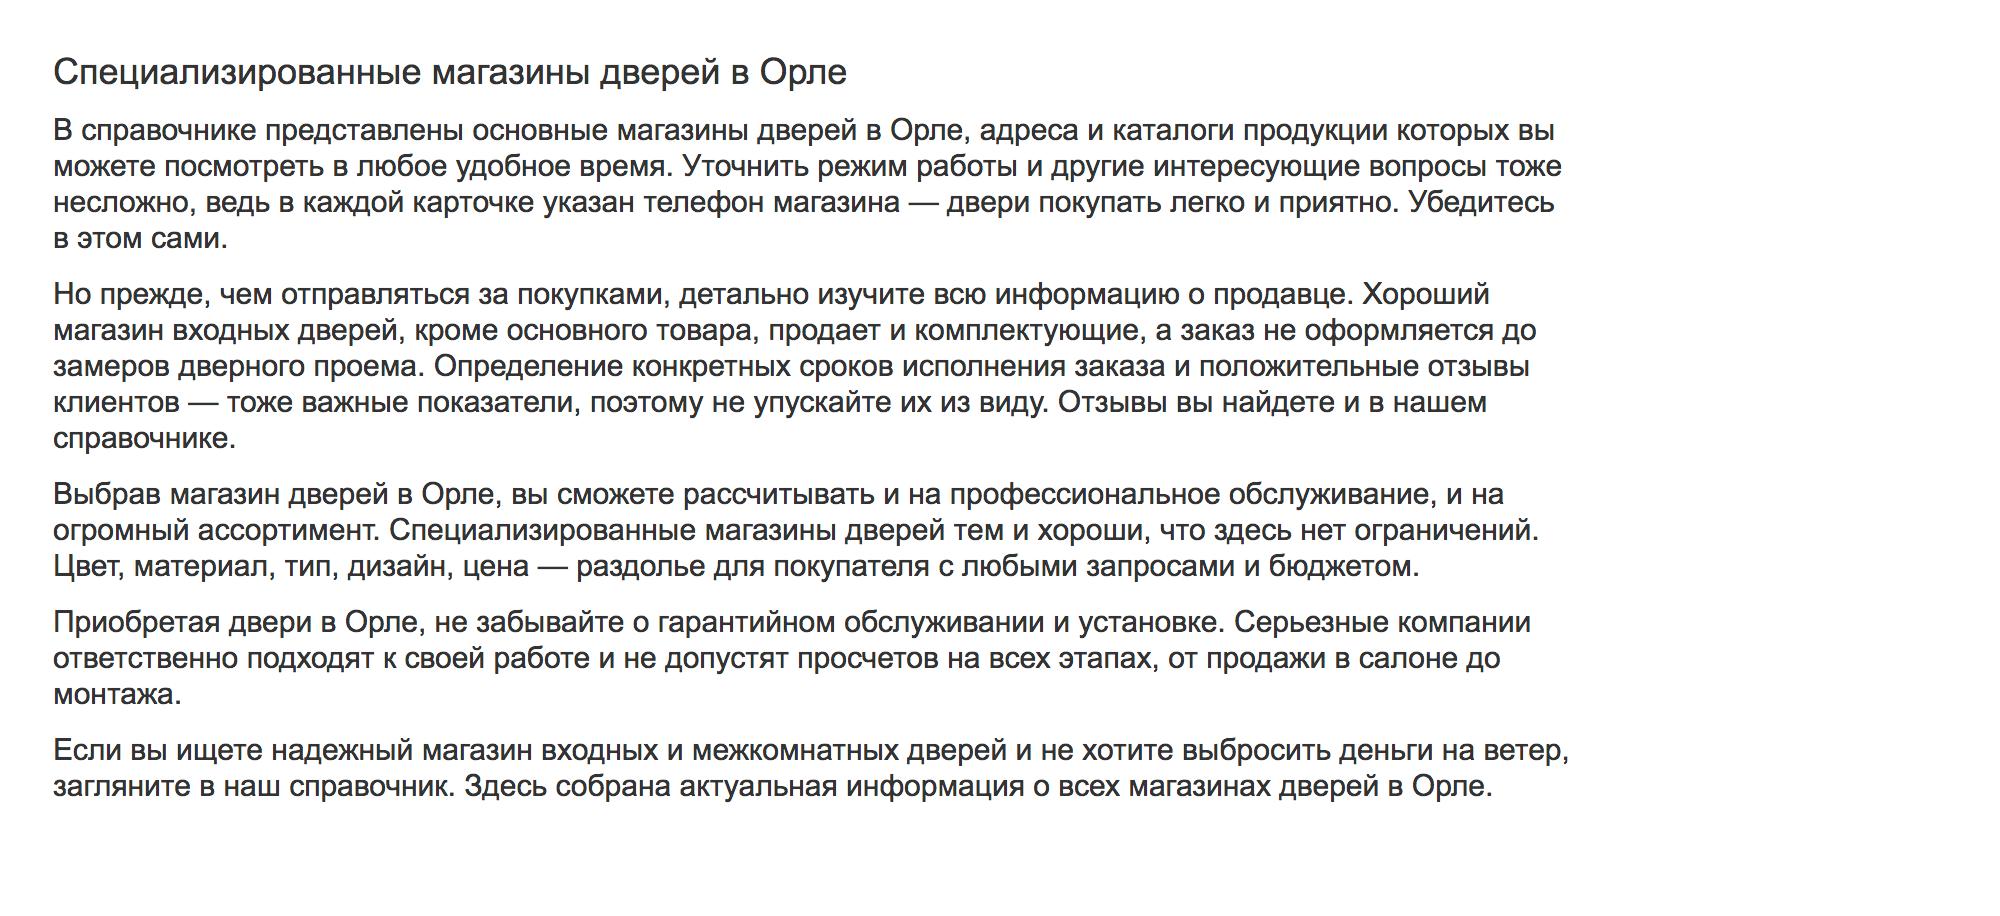 Пример сео-текста